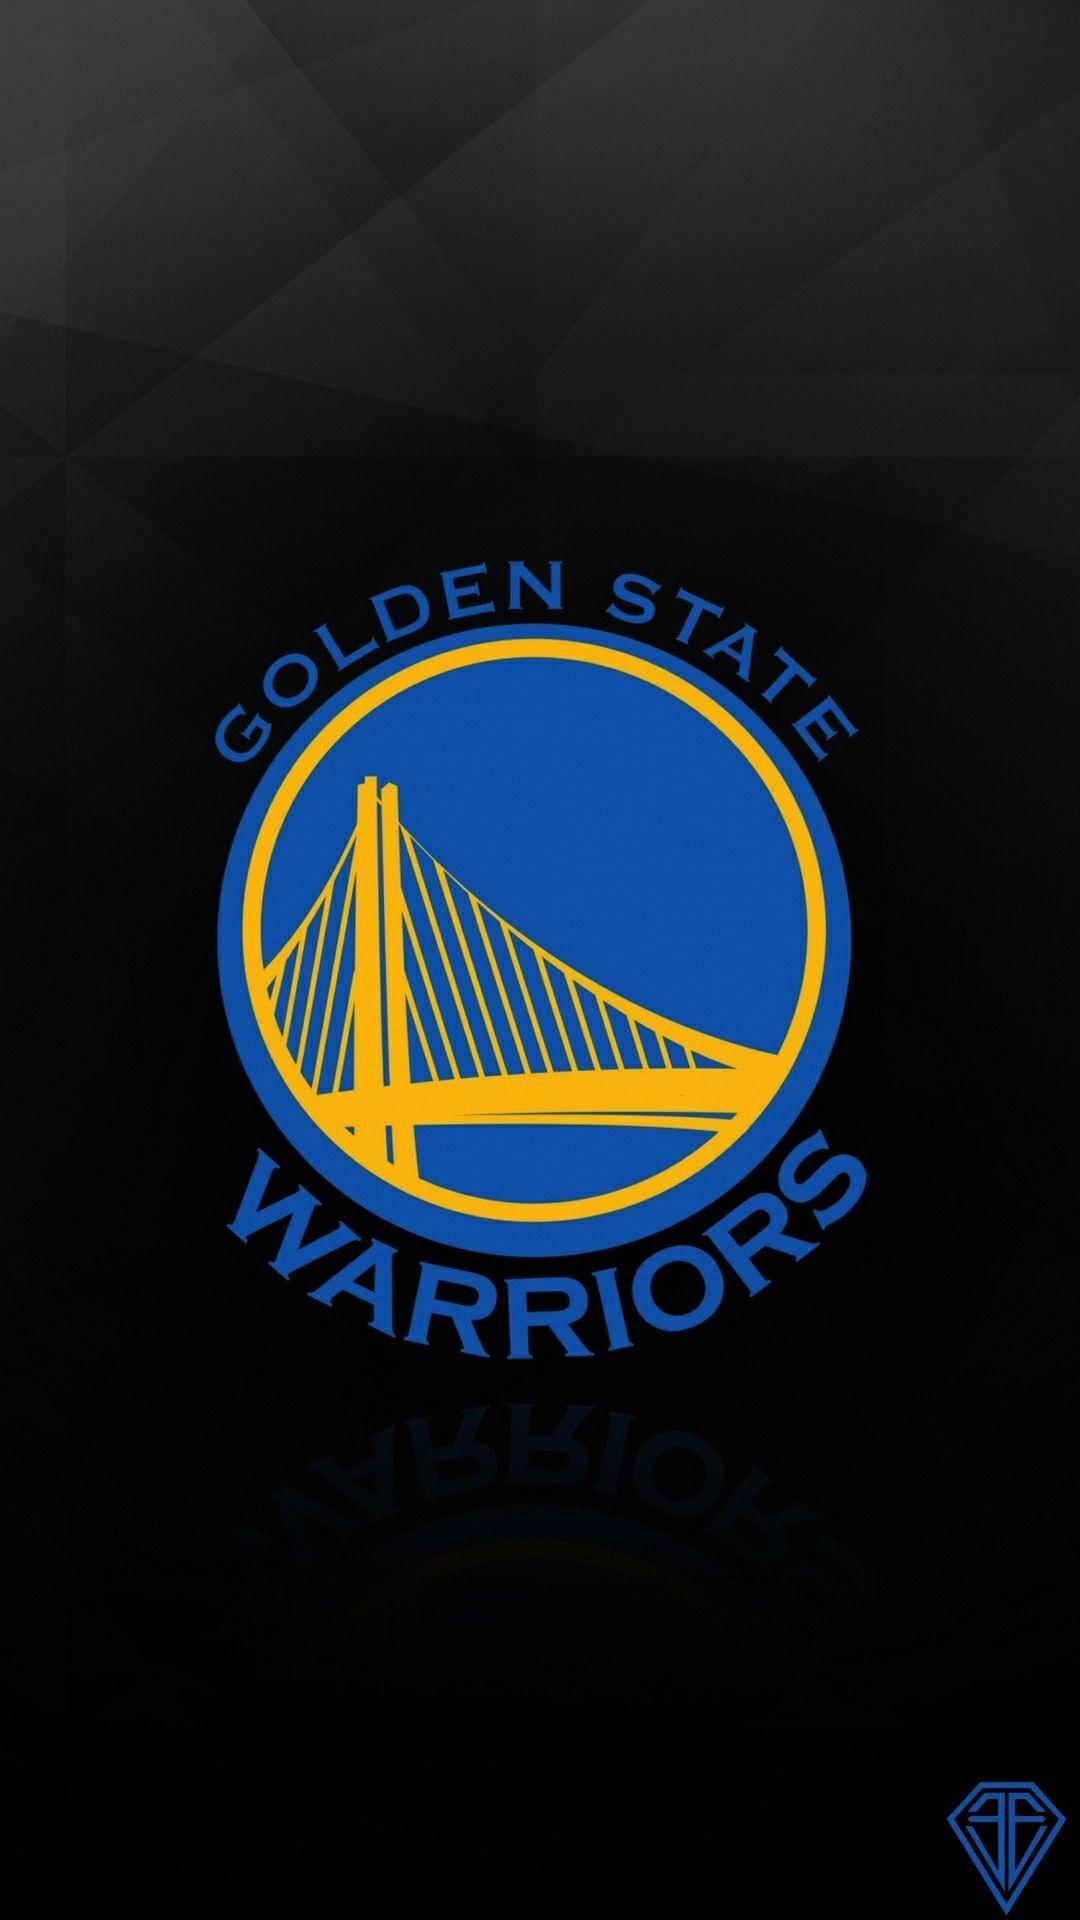 Wallpaper Download Warrior Golden State Logologo Golden State Warrior Wallpaper Download Golden State Warriors Wallpaper Warriors Wallpaper Golden State